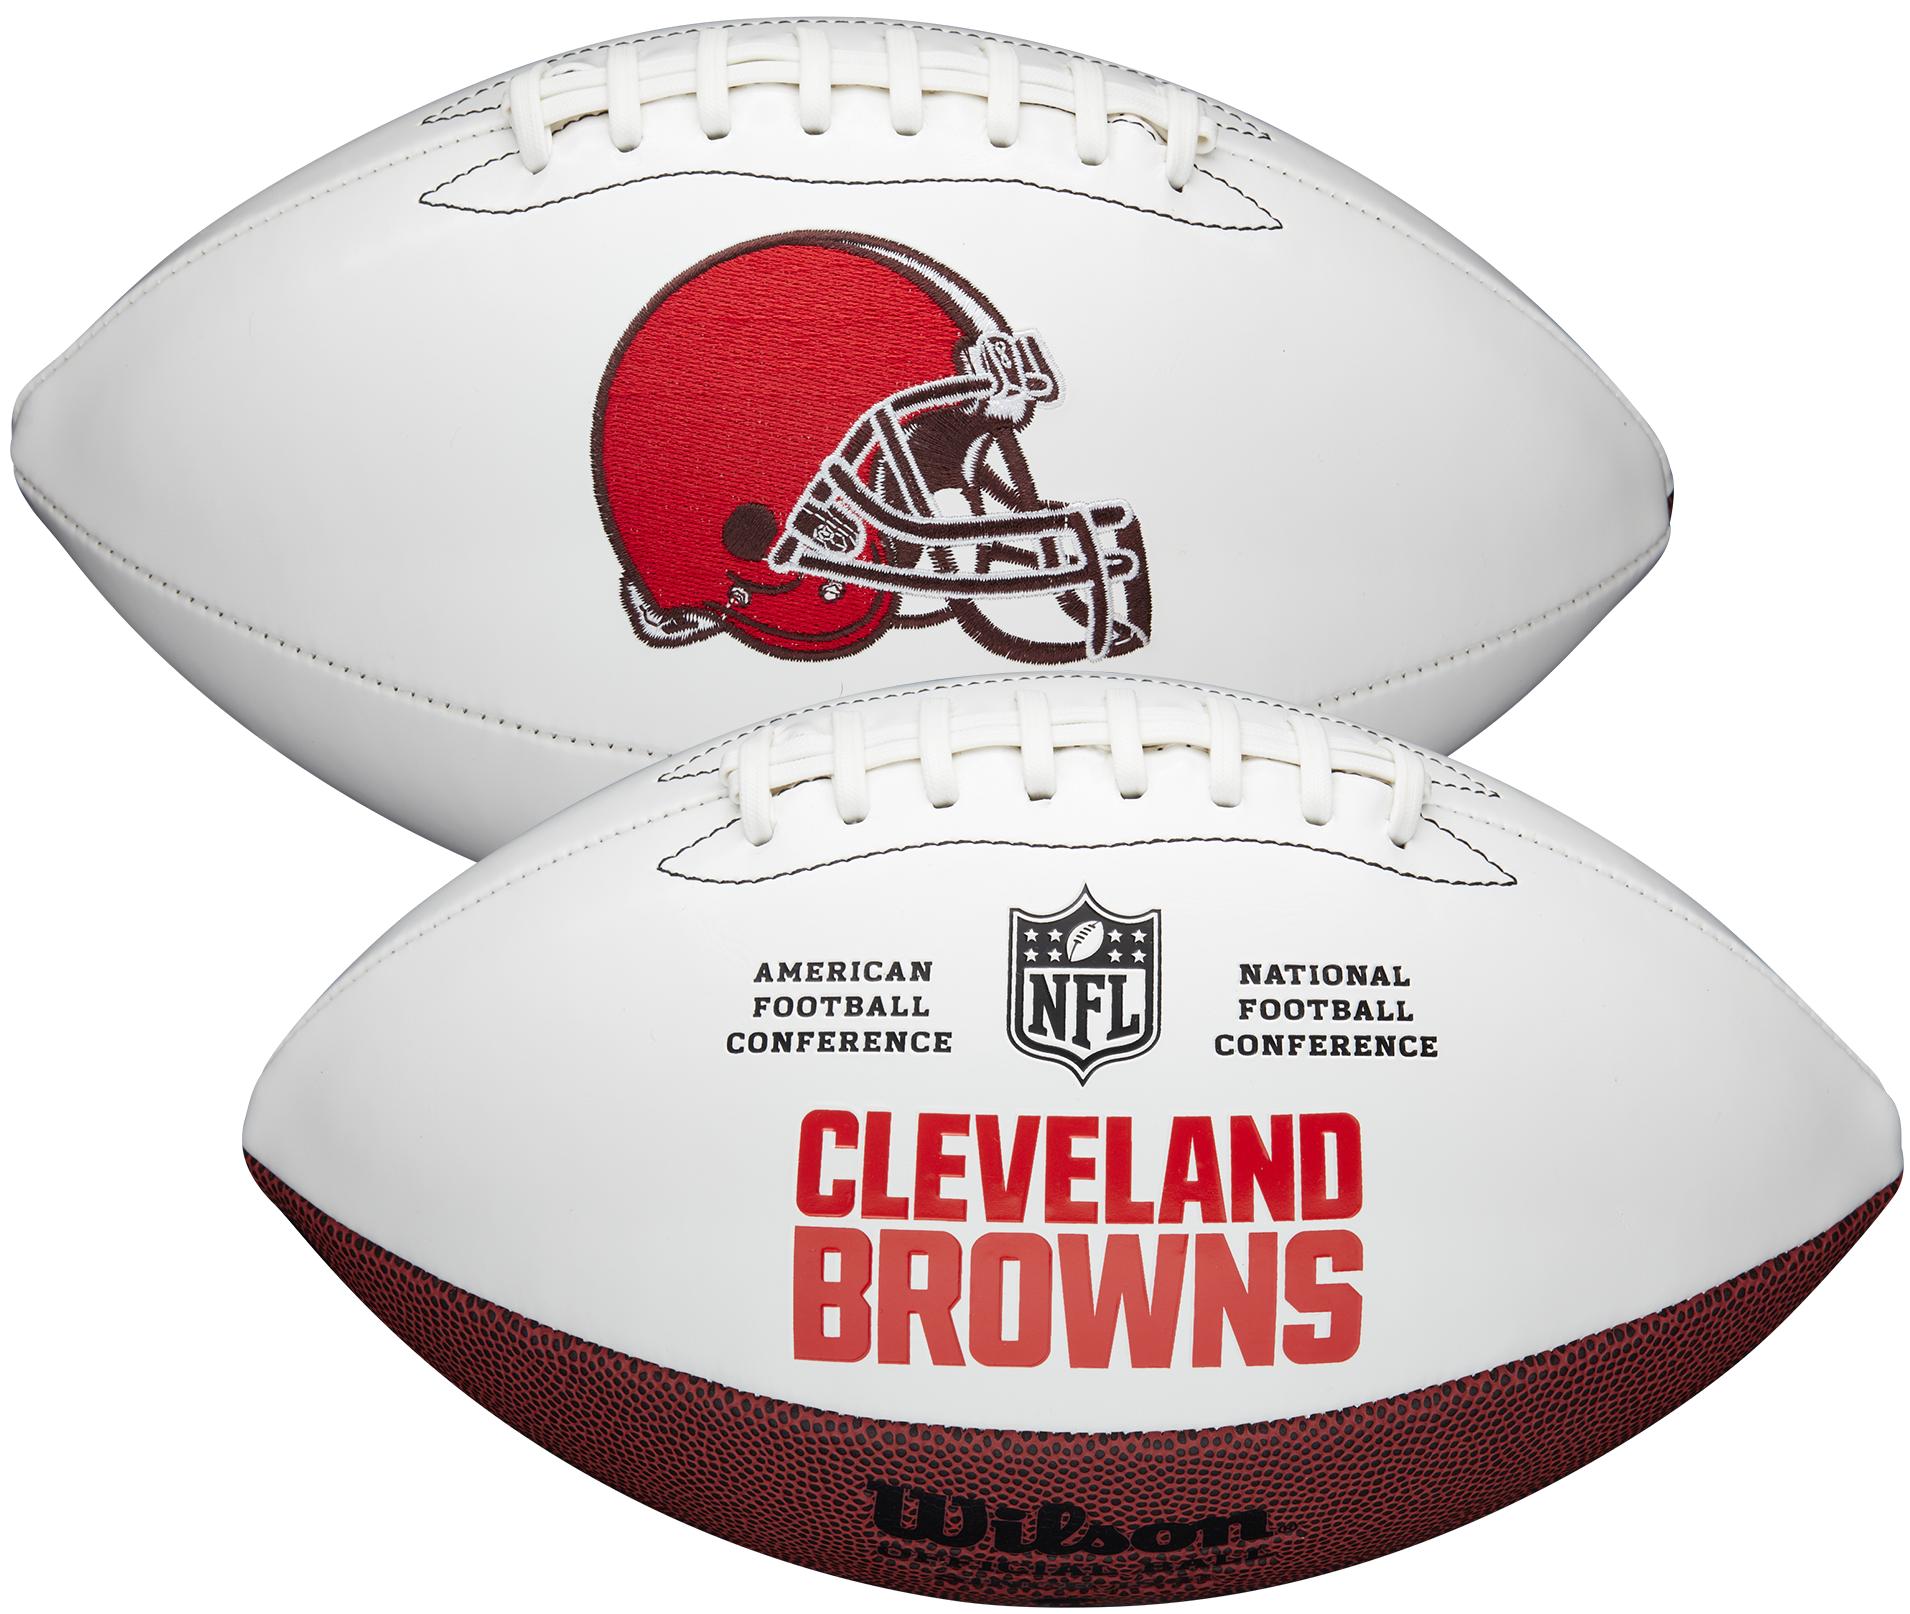 Wilson Cleveland Browns Official NFL Autograph Series Football